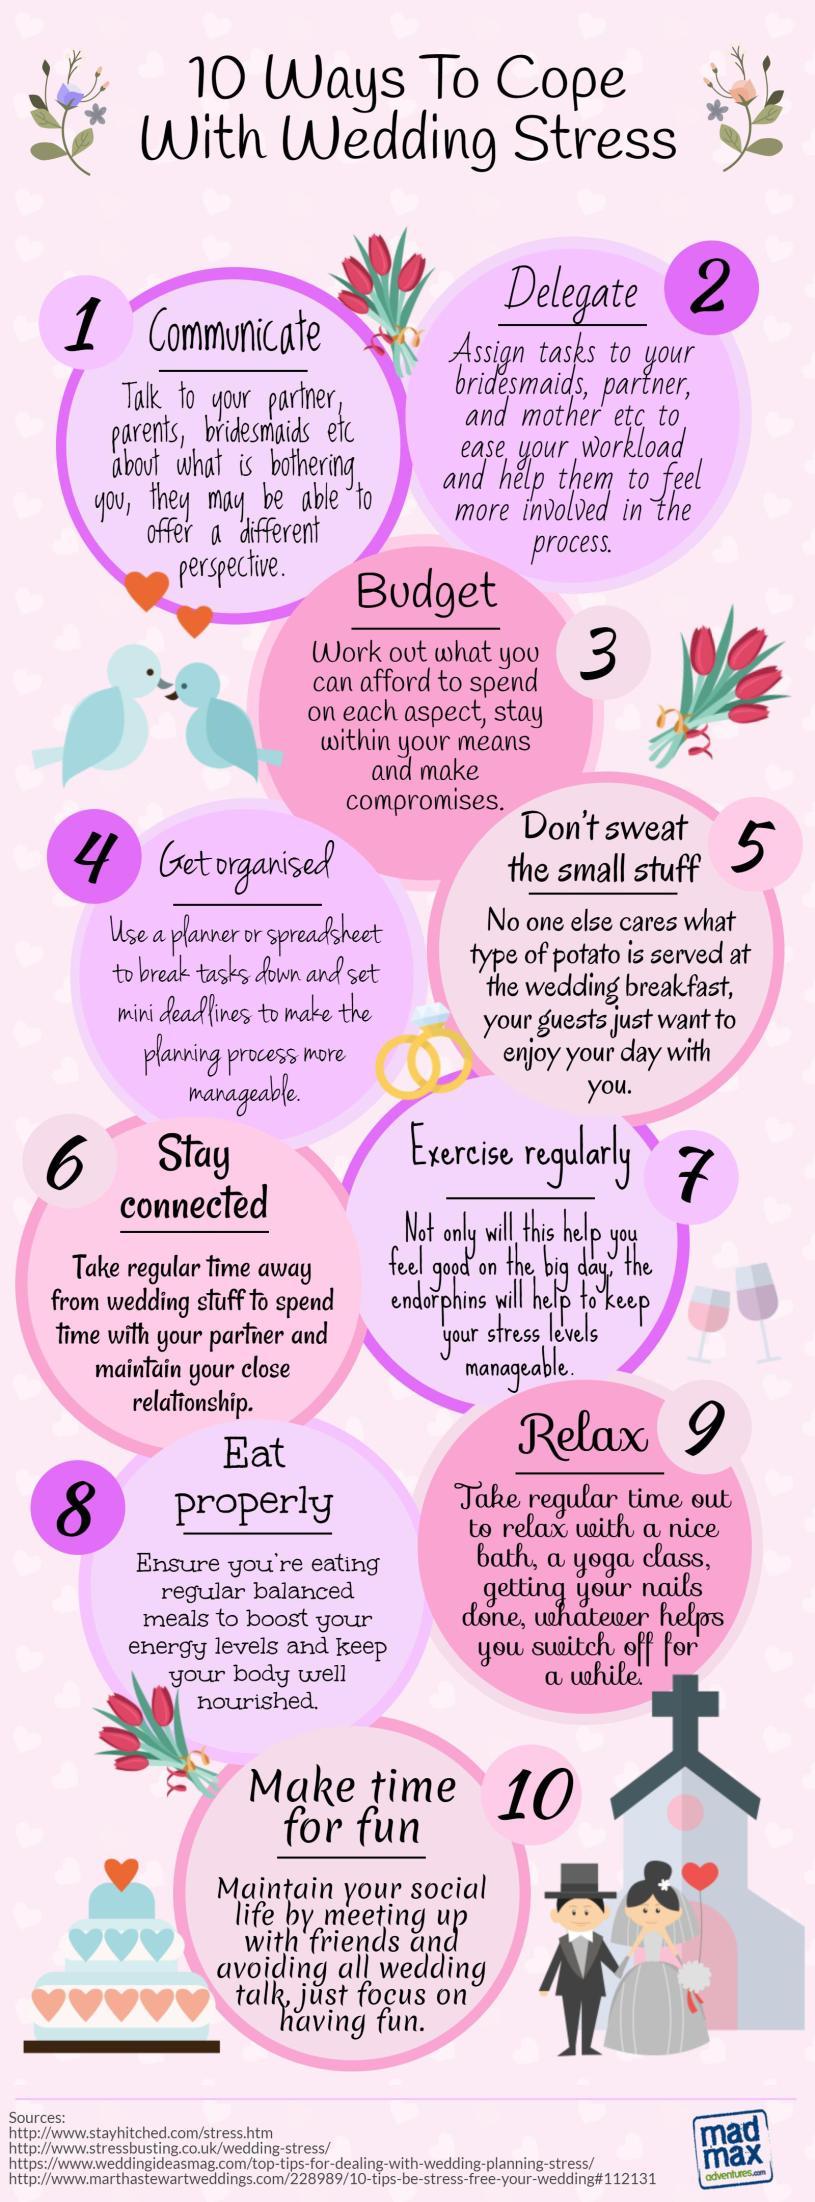 Wedding Stress Infographic